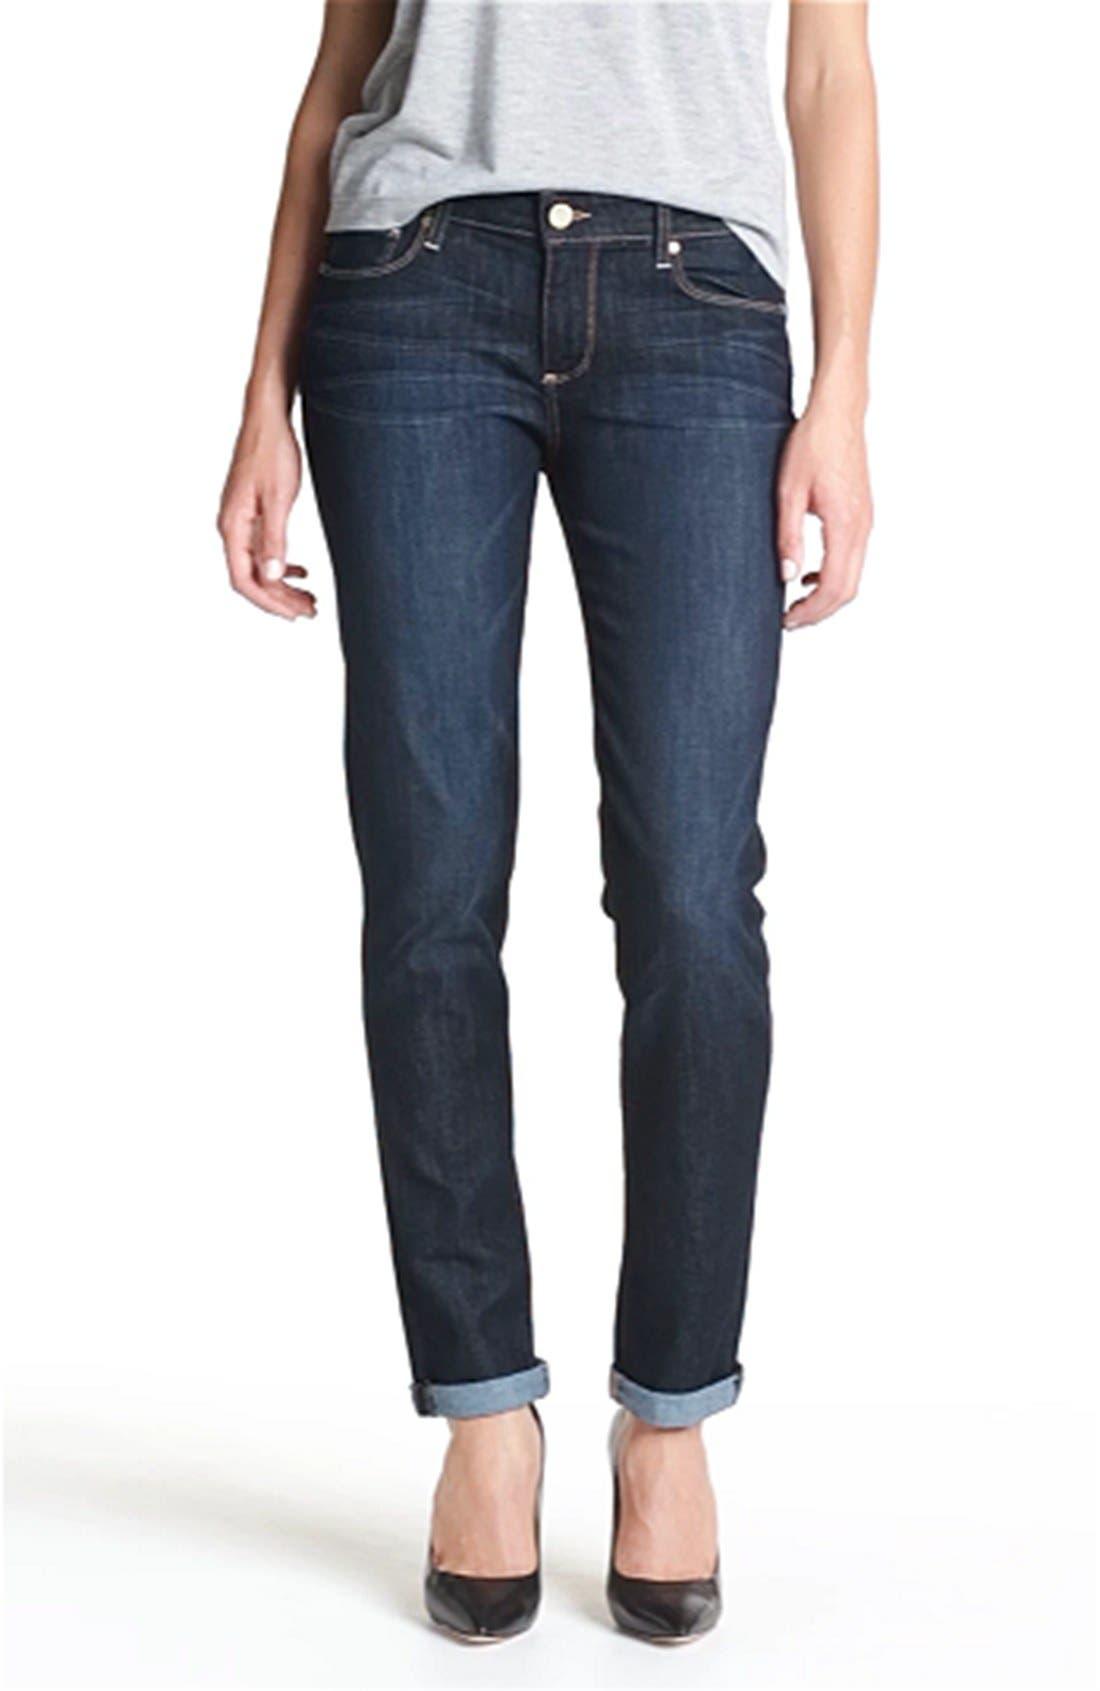 Denim 'Jimmy Jimmy' Stretch Jeans,                             Alternate thumbnail 3, color,                             410